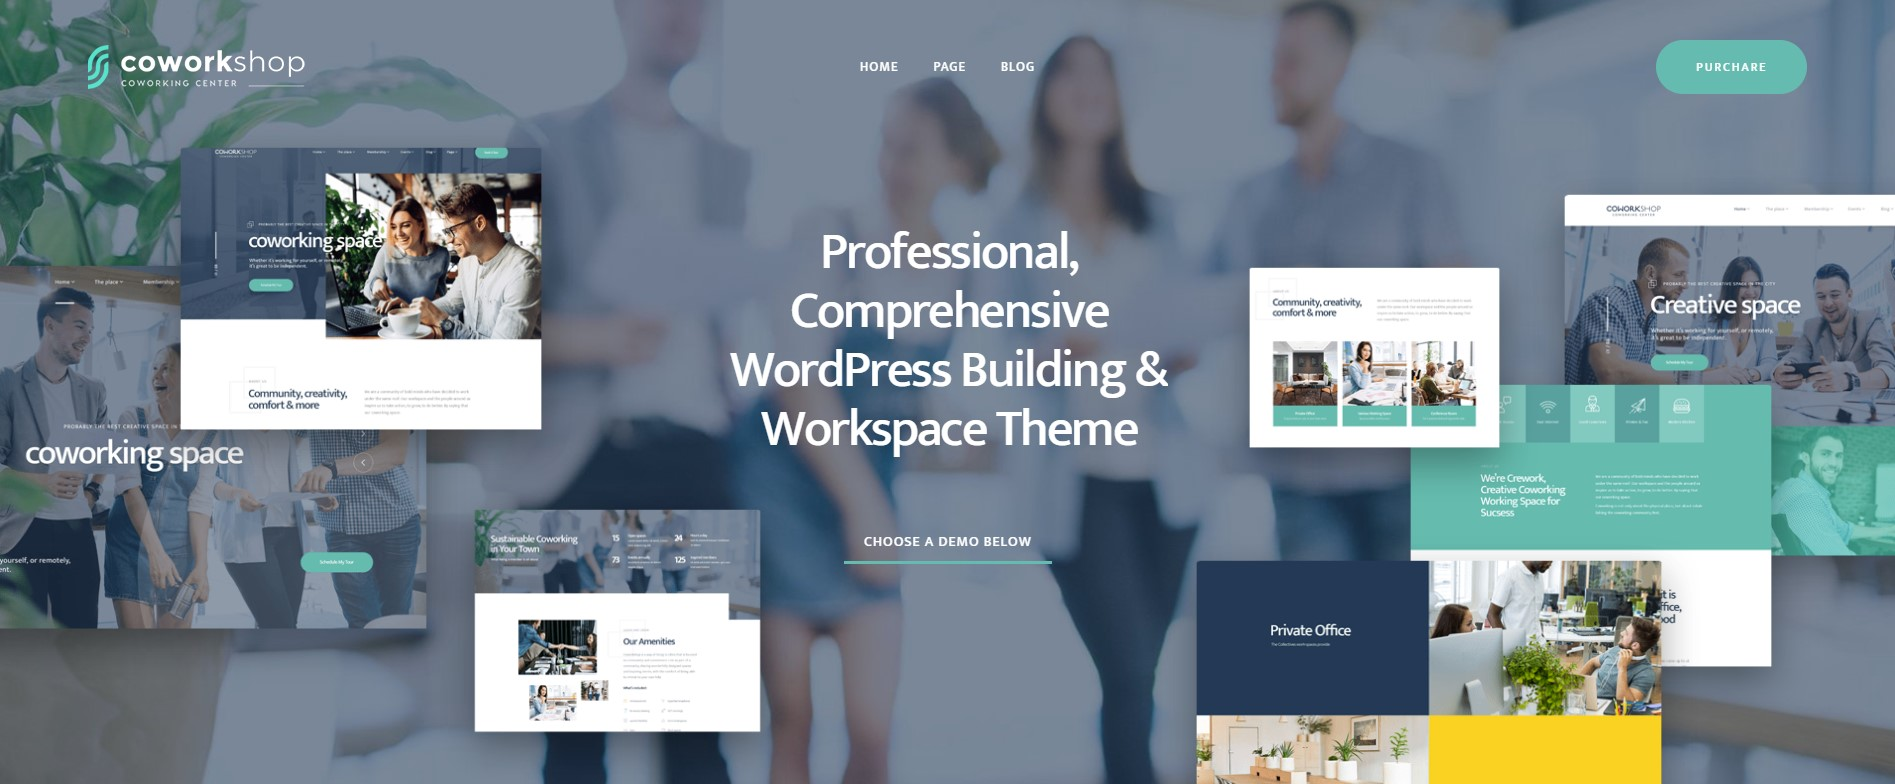 Coworkshop Work Space WordPress Theme